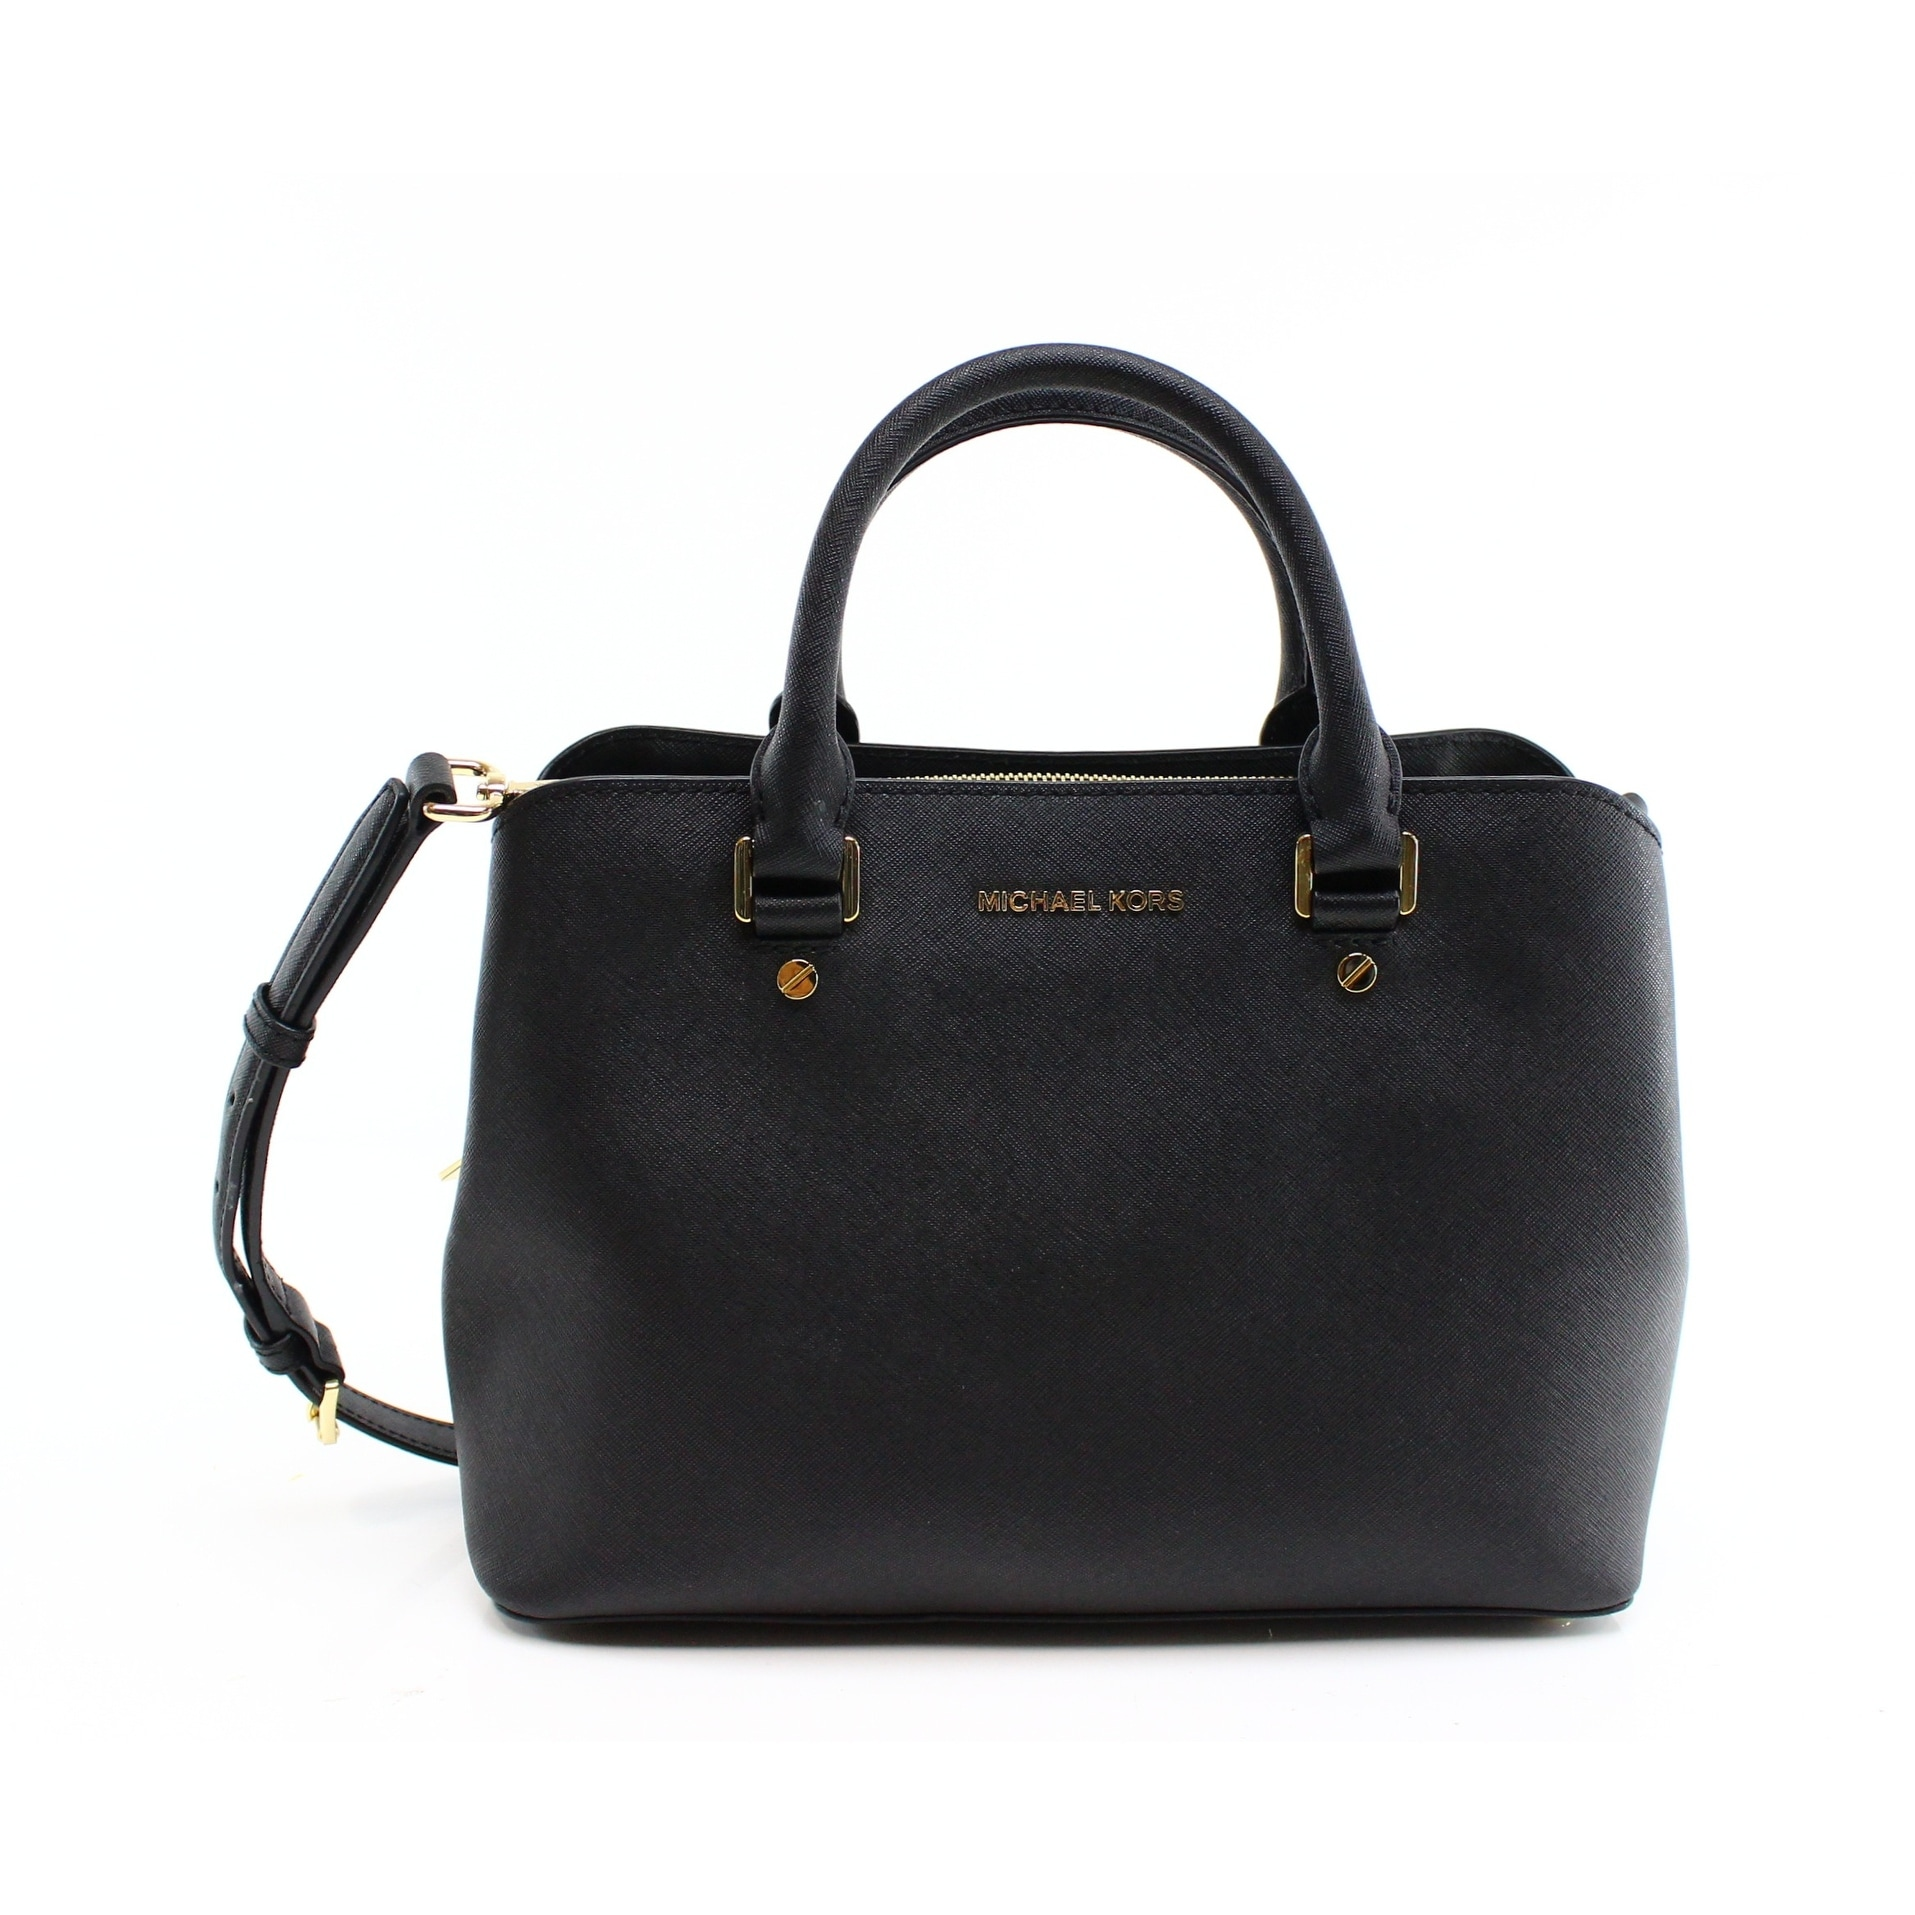 29b74dba9880c5 Shop Michael Kors NEW Black Gold Saffiano Leather Savannah Satchel Handbag  - Free Shipping Today - Overstock - 17858031